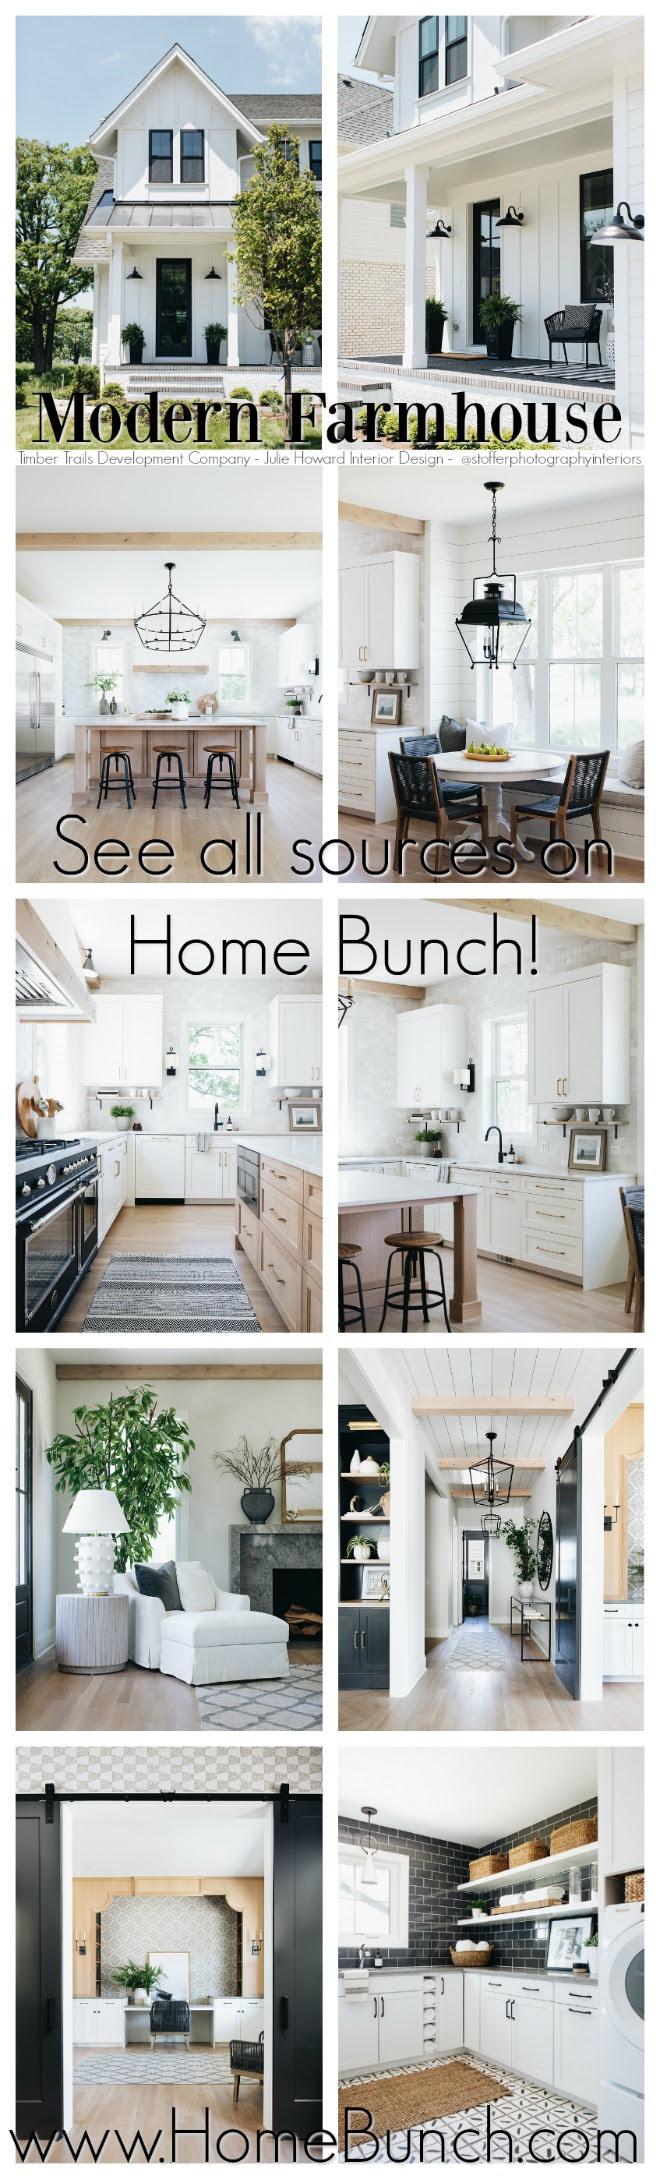 Modern English Country Home Design Home Bunch Interior Design Ideas